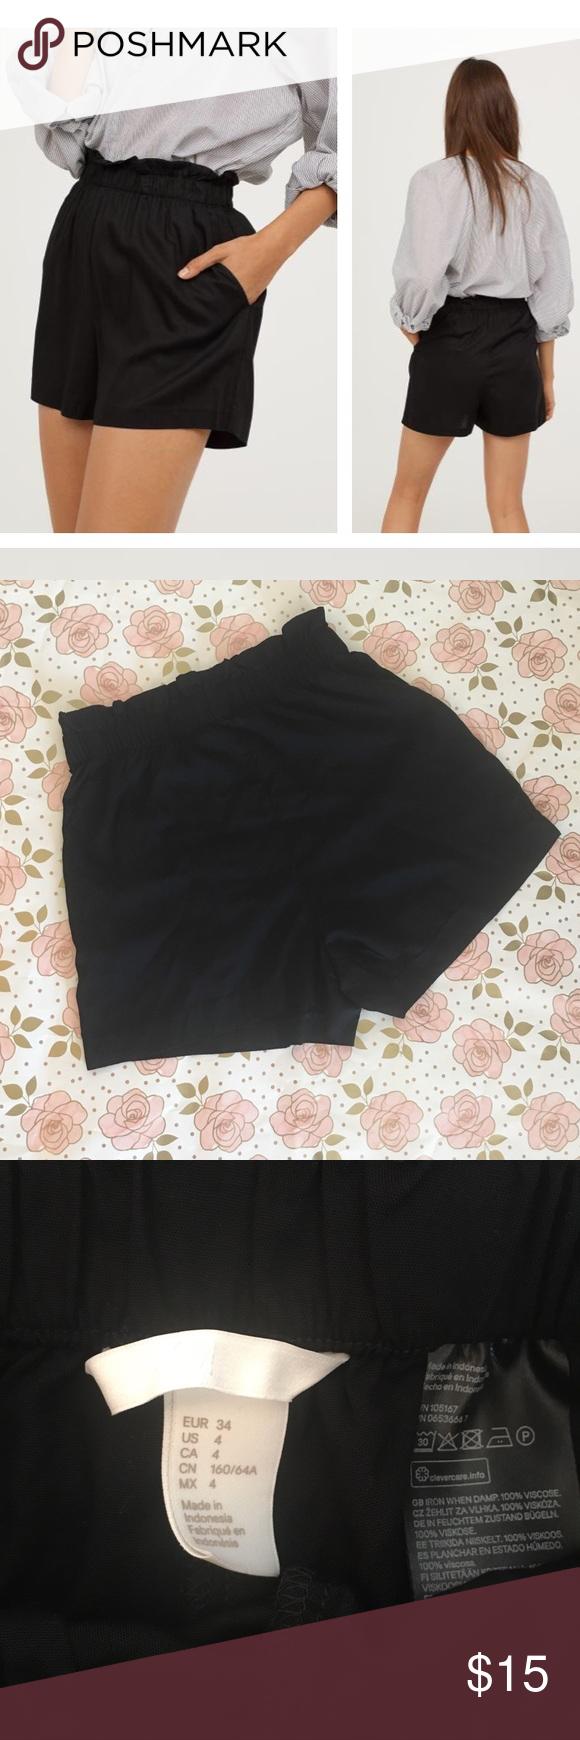 be39e4150d1 H&M Wide Cut Black Shorts Short, wide-cut shorts in woven viscose fabric.